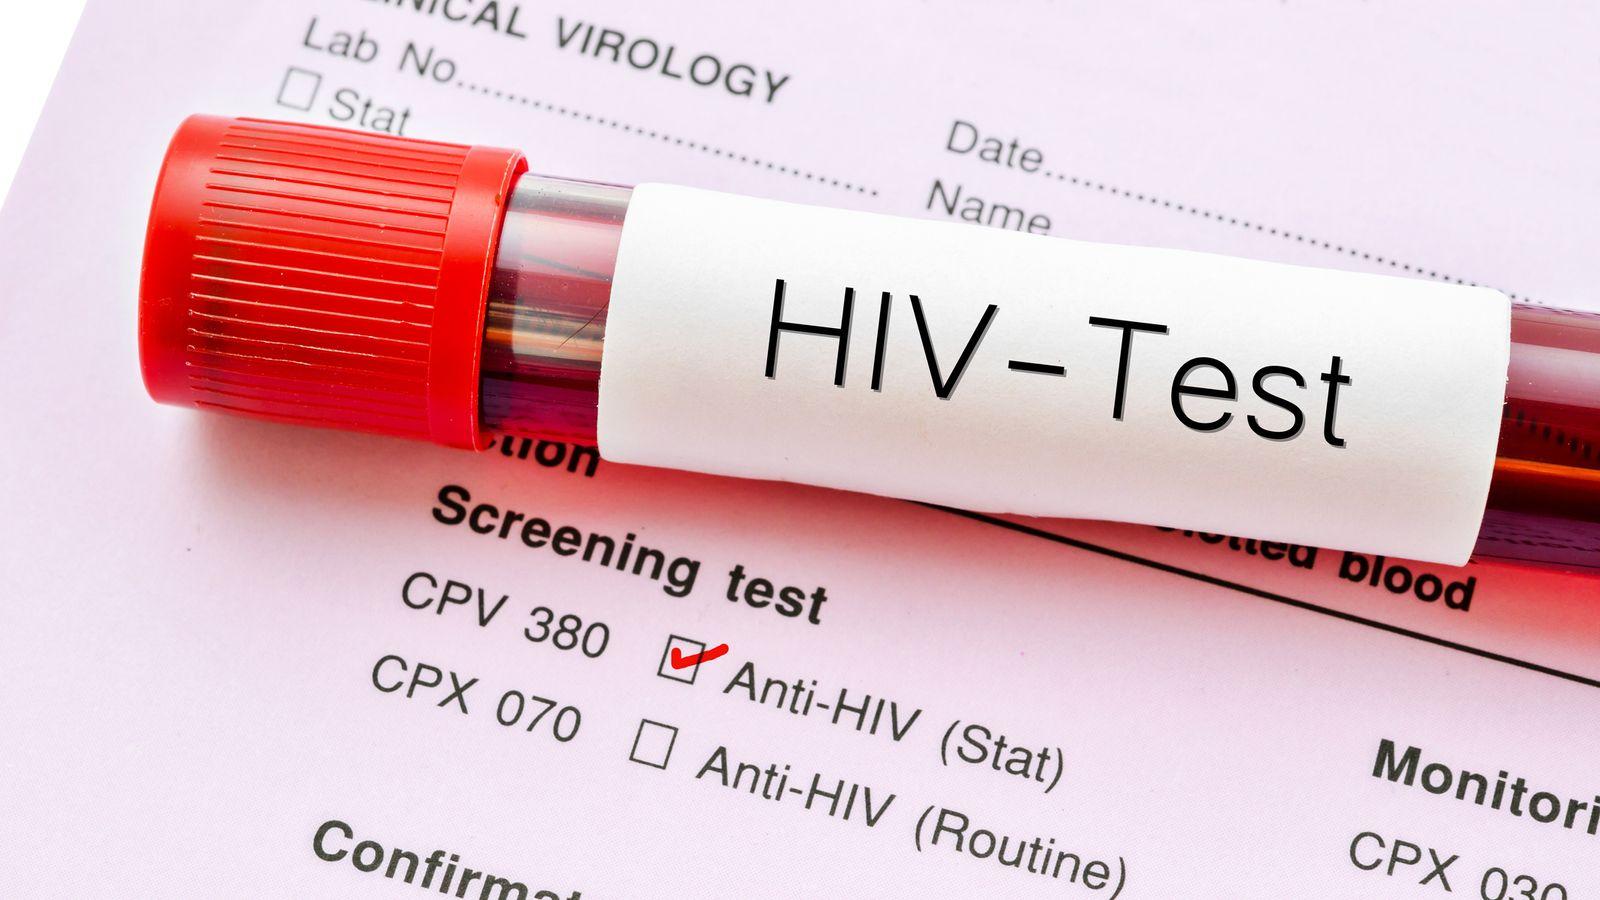 Treatment stops hiv transmission study finds uk news sky news - Test hiv p24 periodo finestra ...